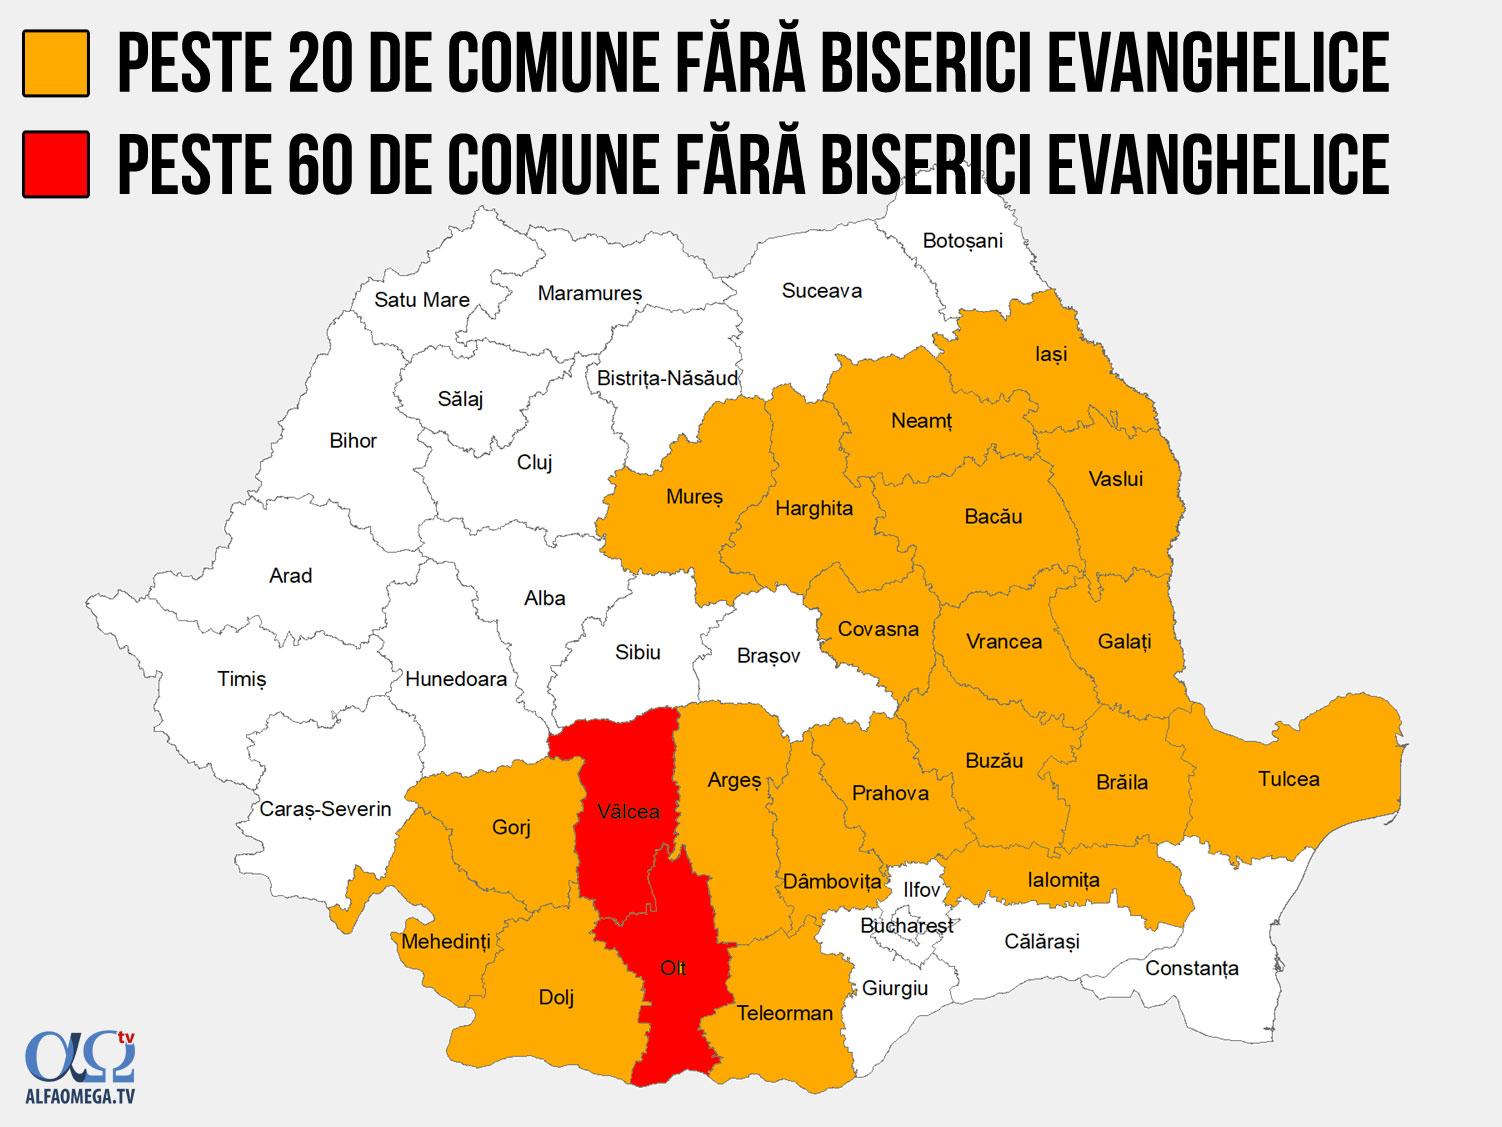 bisericile evanghelice din ro comune fara biserici ev